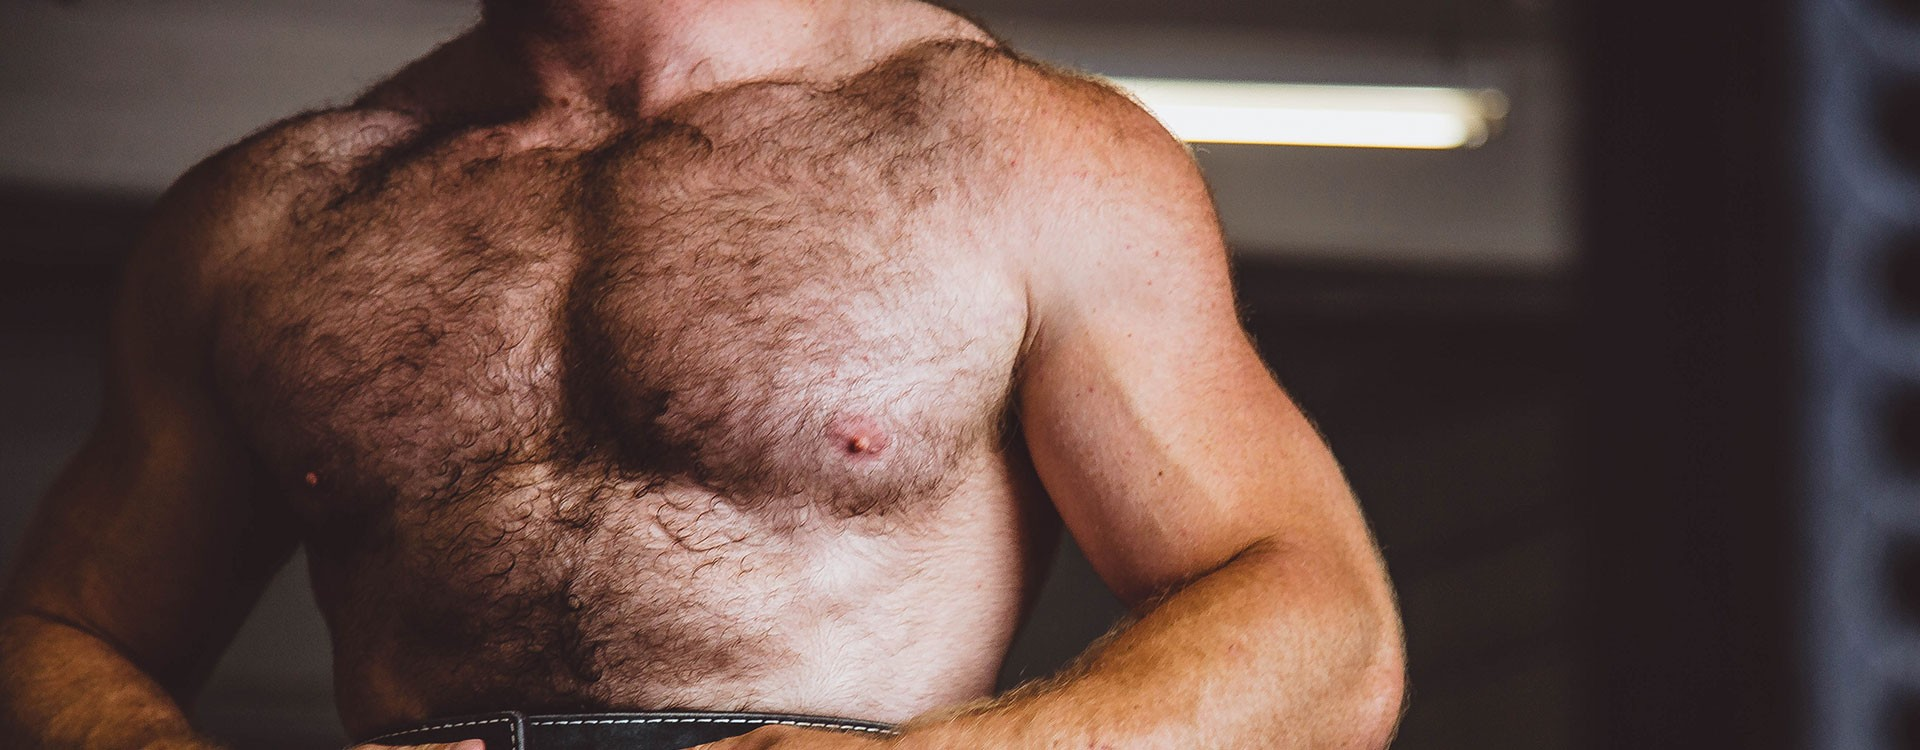 Aumentar testosterona de manera natural